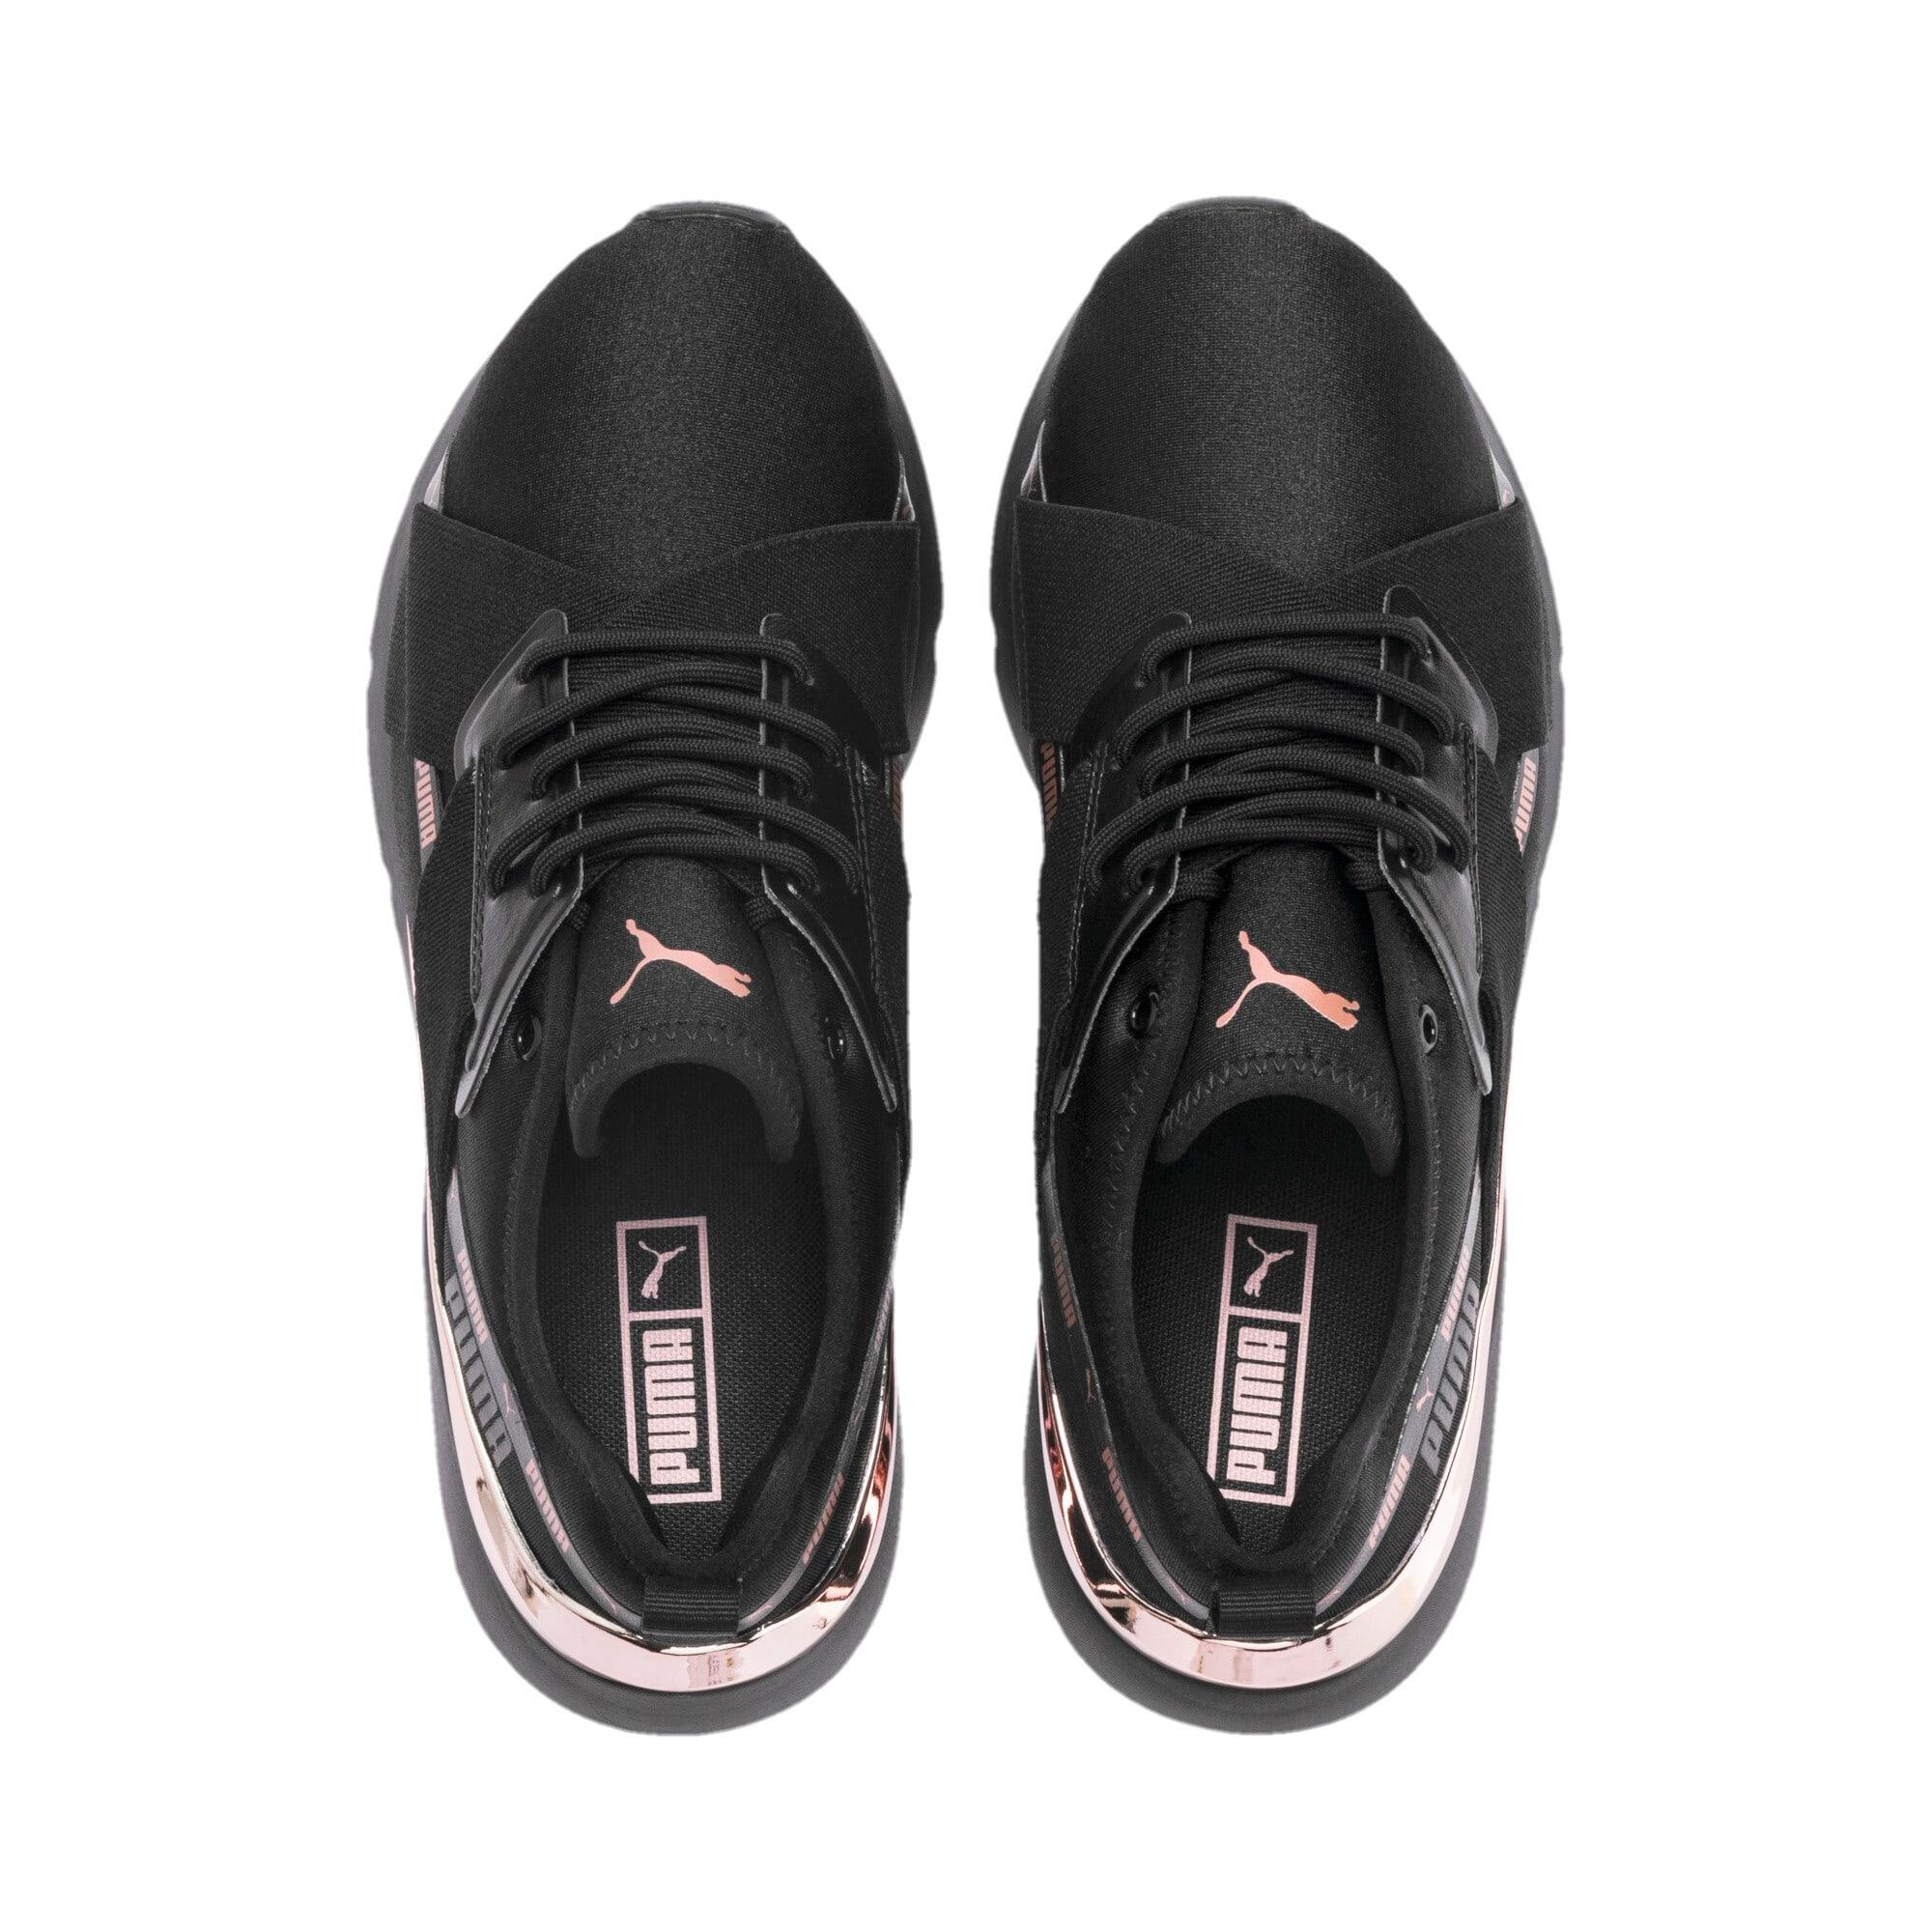 Thumbnail 7 of Muse X-2 Metallic Women's Sneakers, Puma Black-Rose Gold, medium